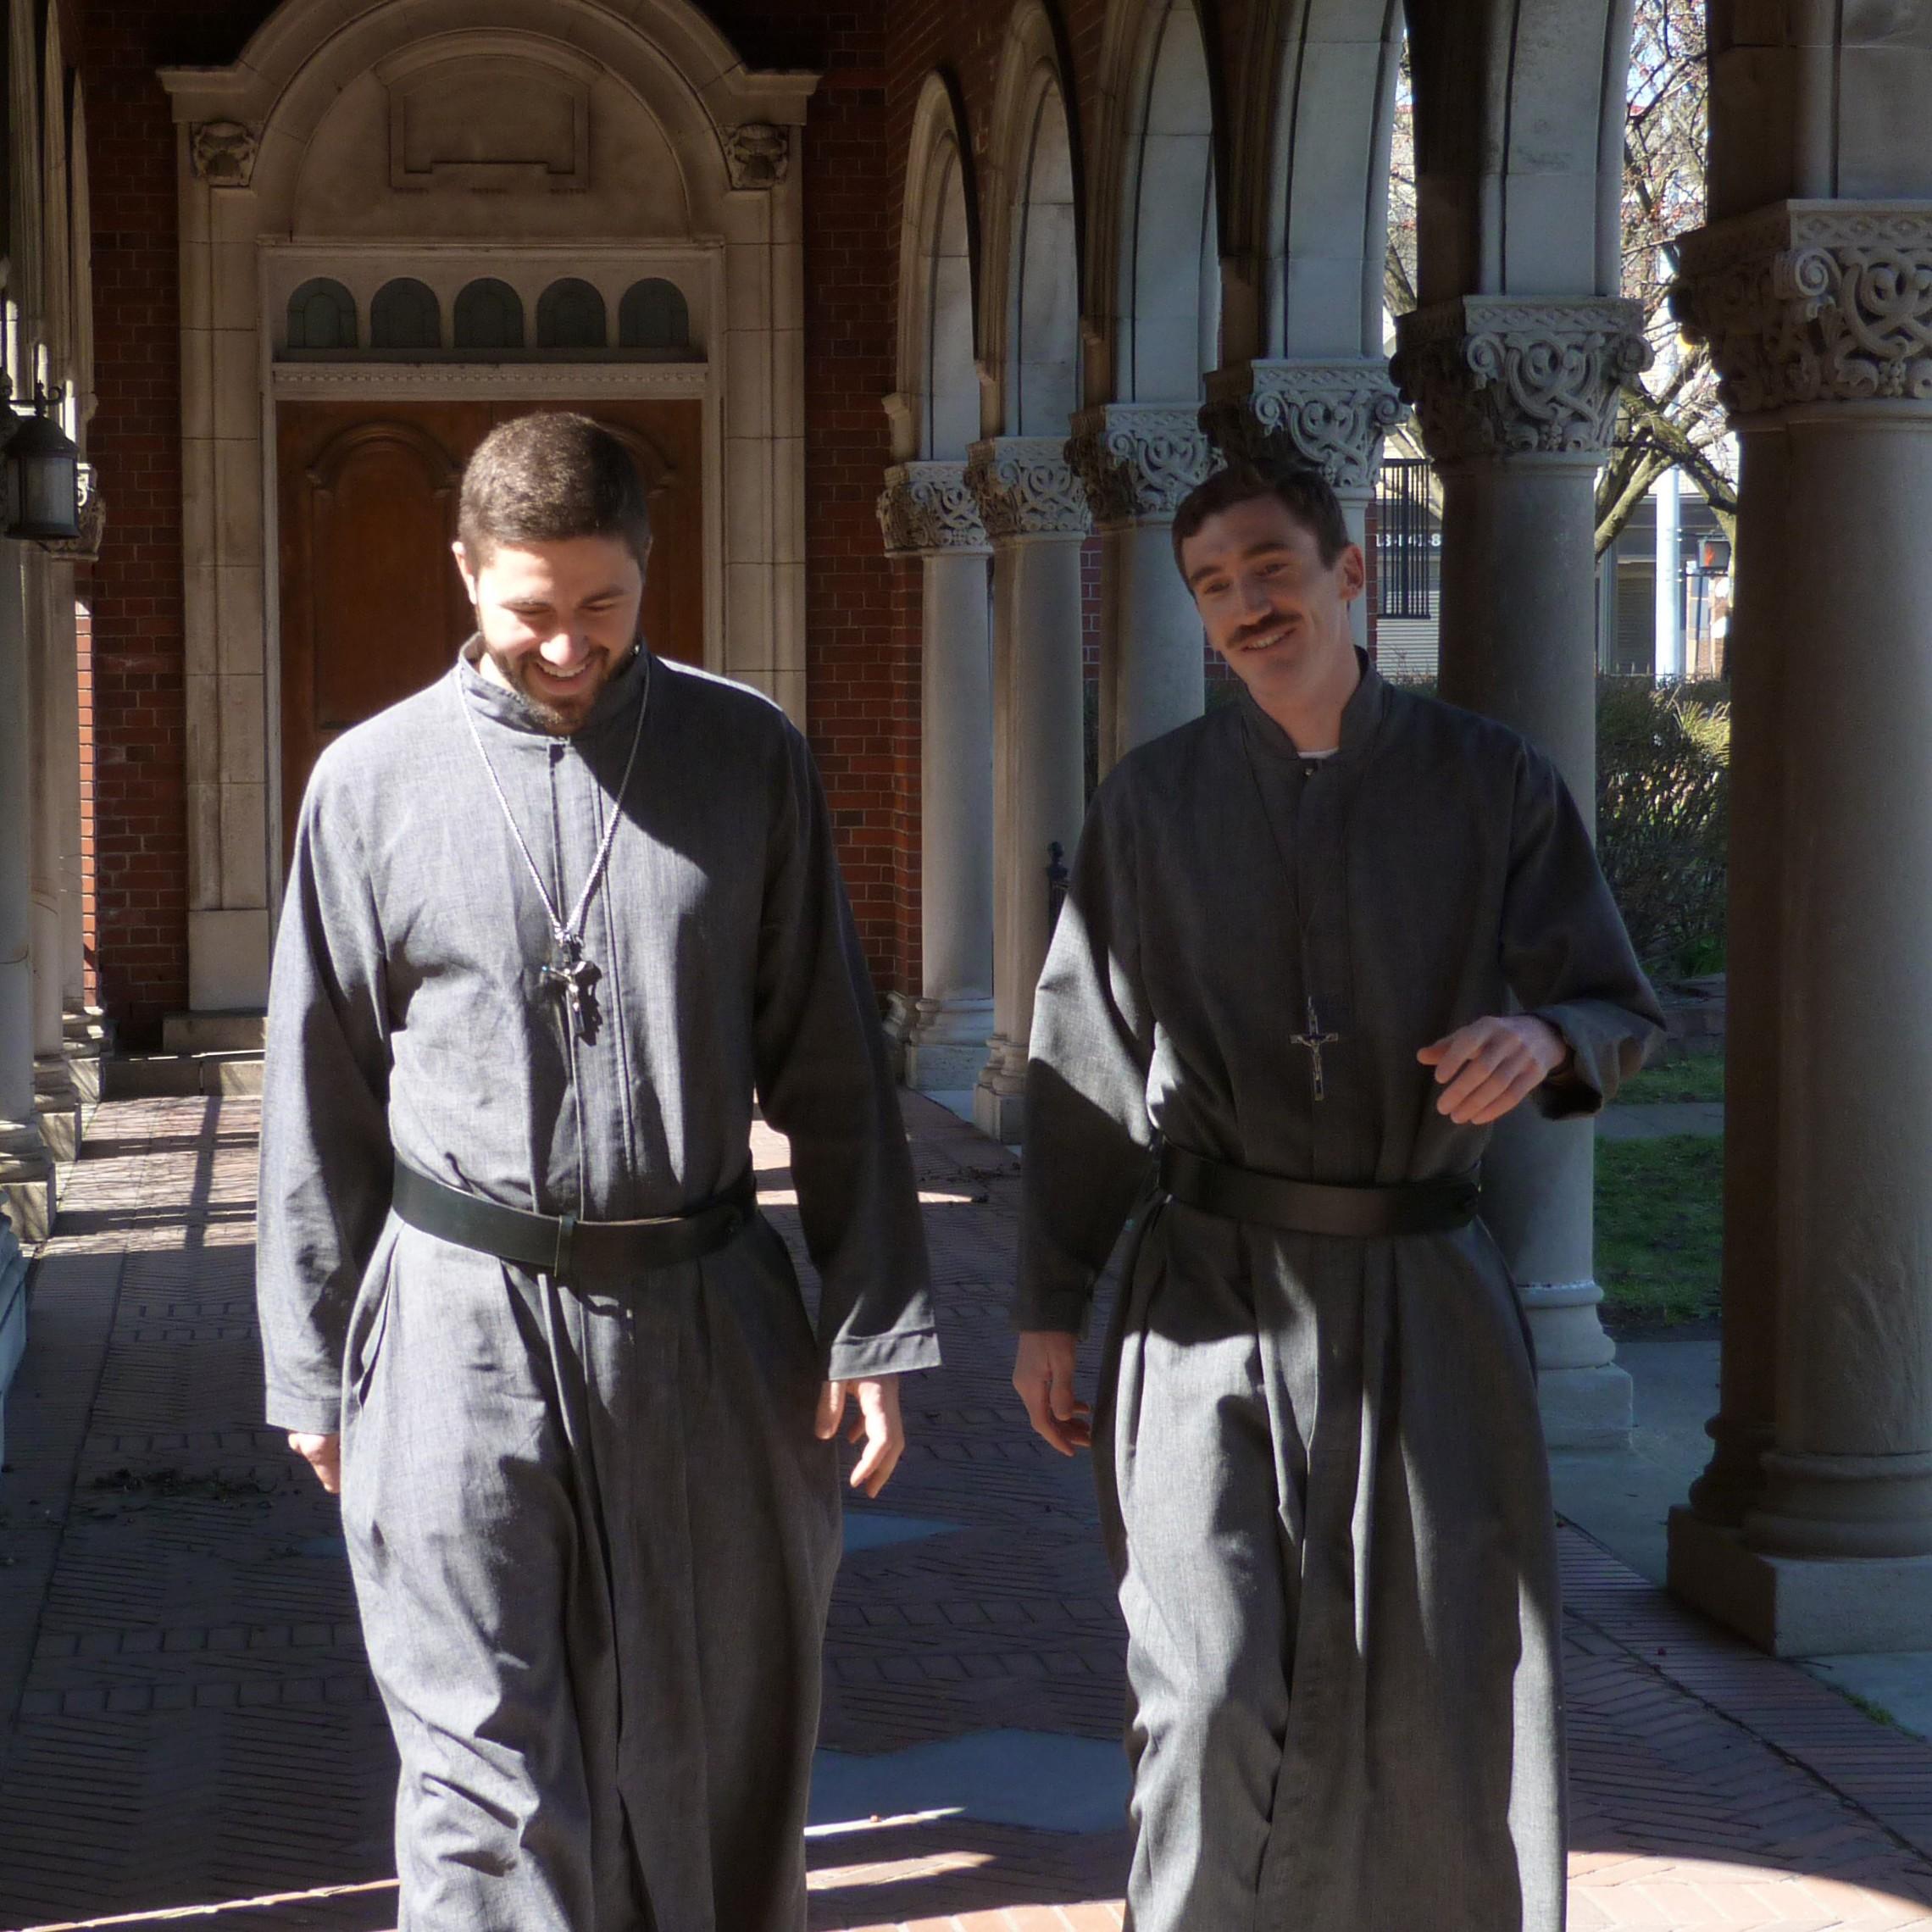 vocations brothers andrew joseph